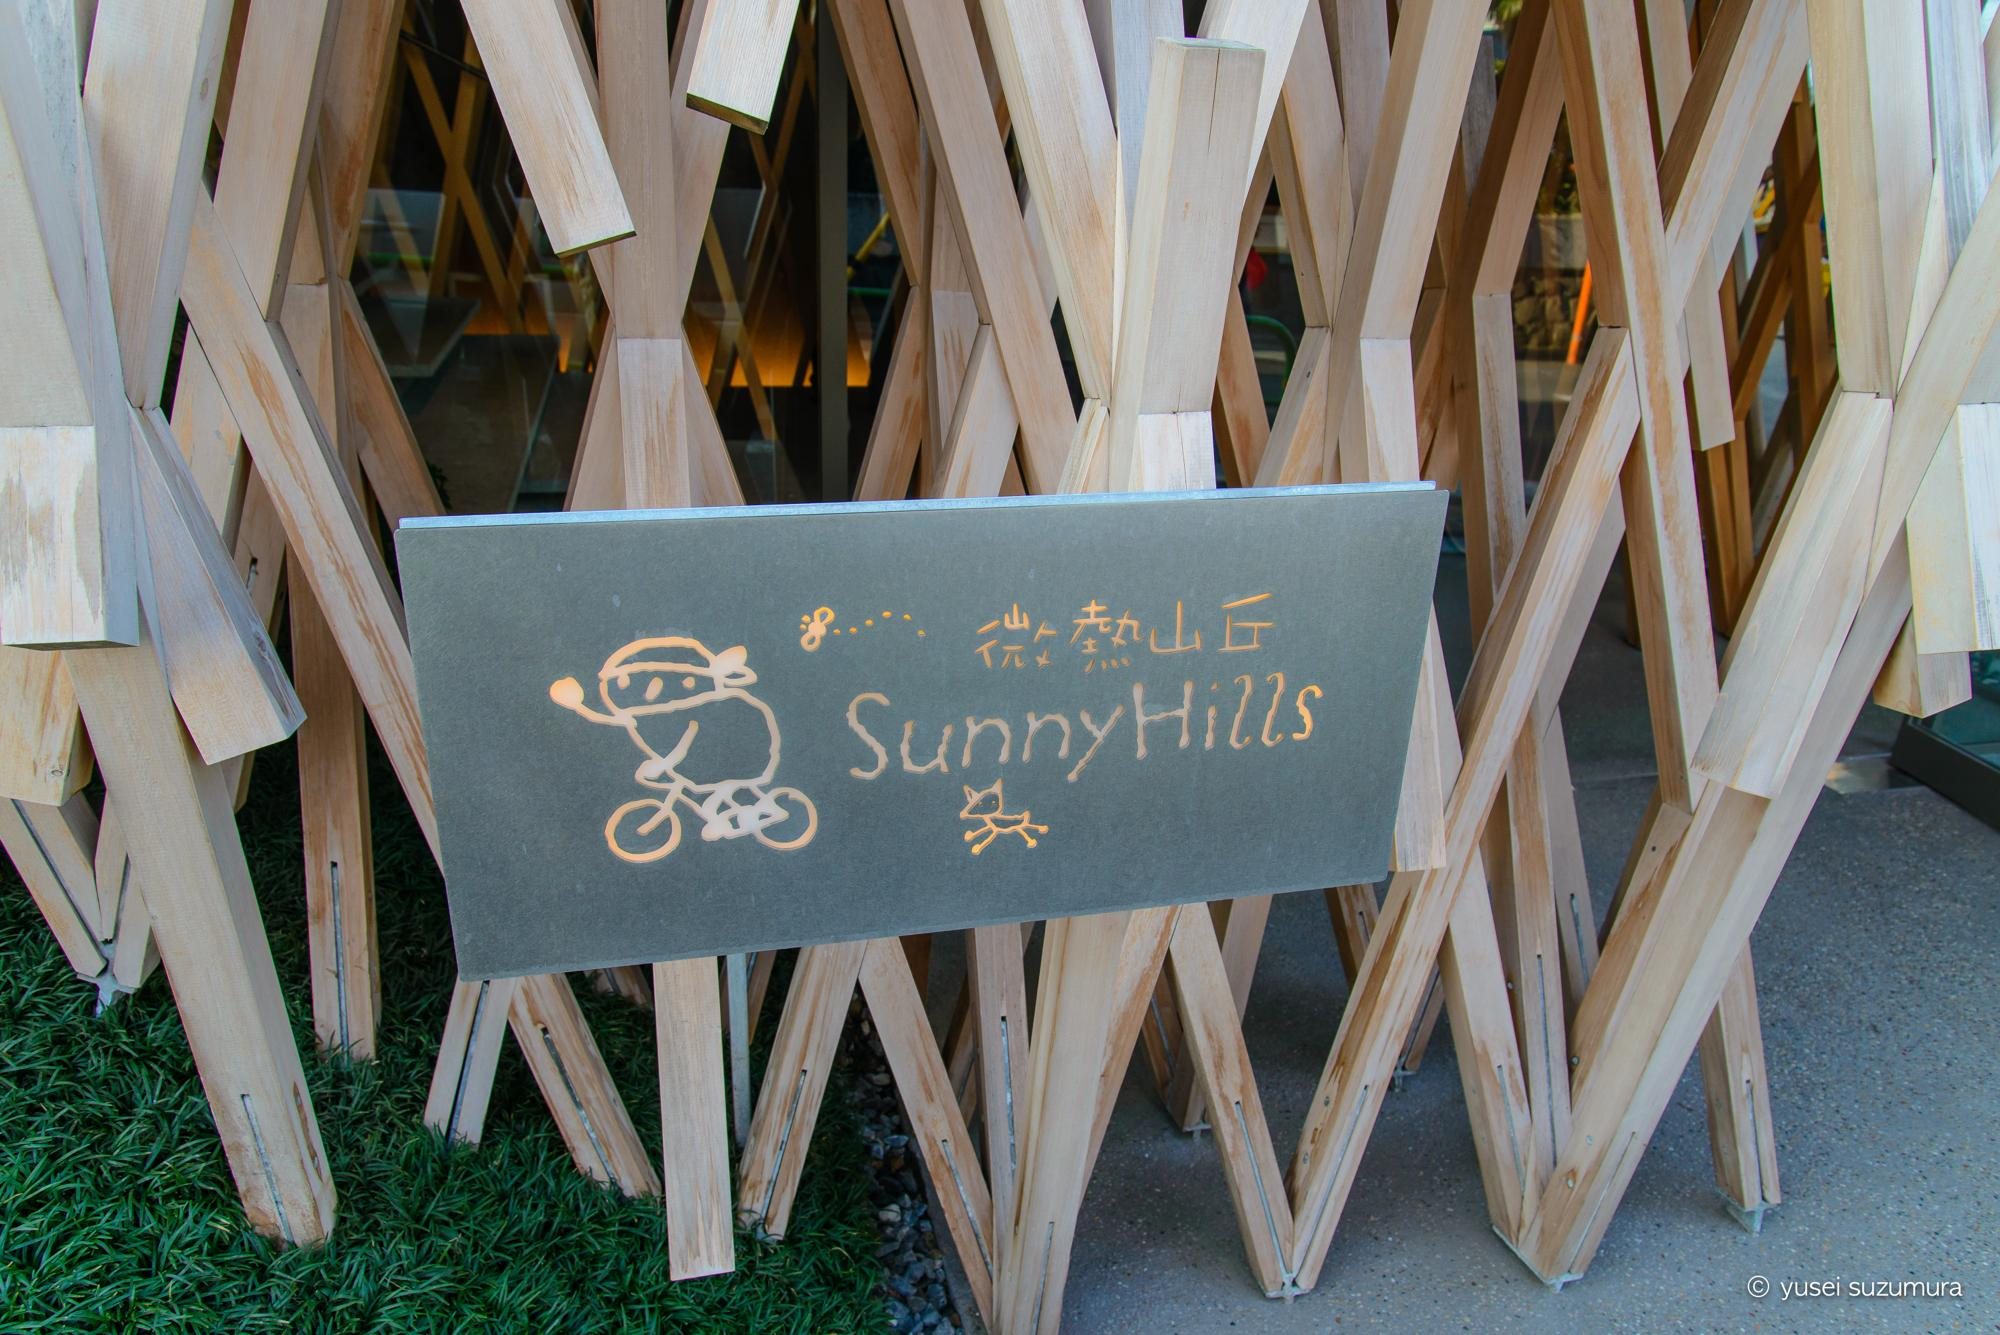 Sunnyhills(微熱山丘)の看板